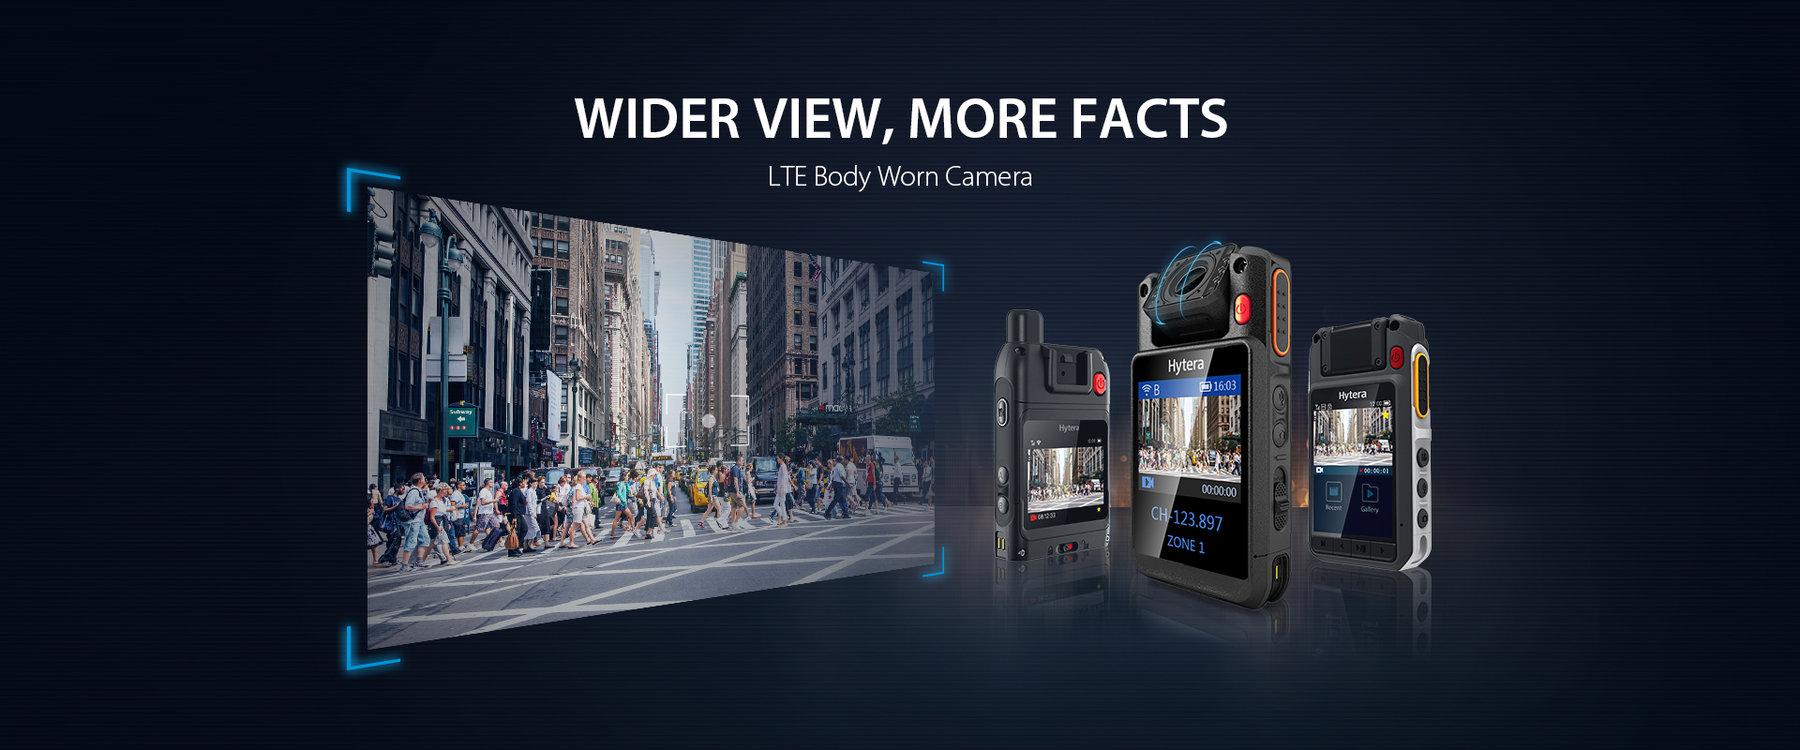 Wider view more facts bodyworn camera